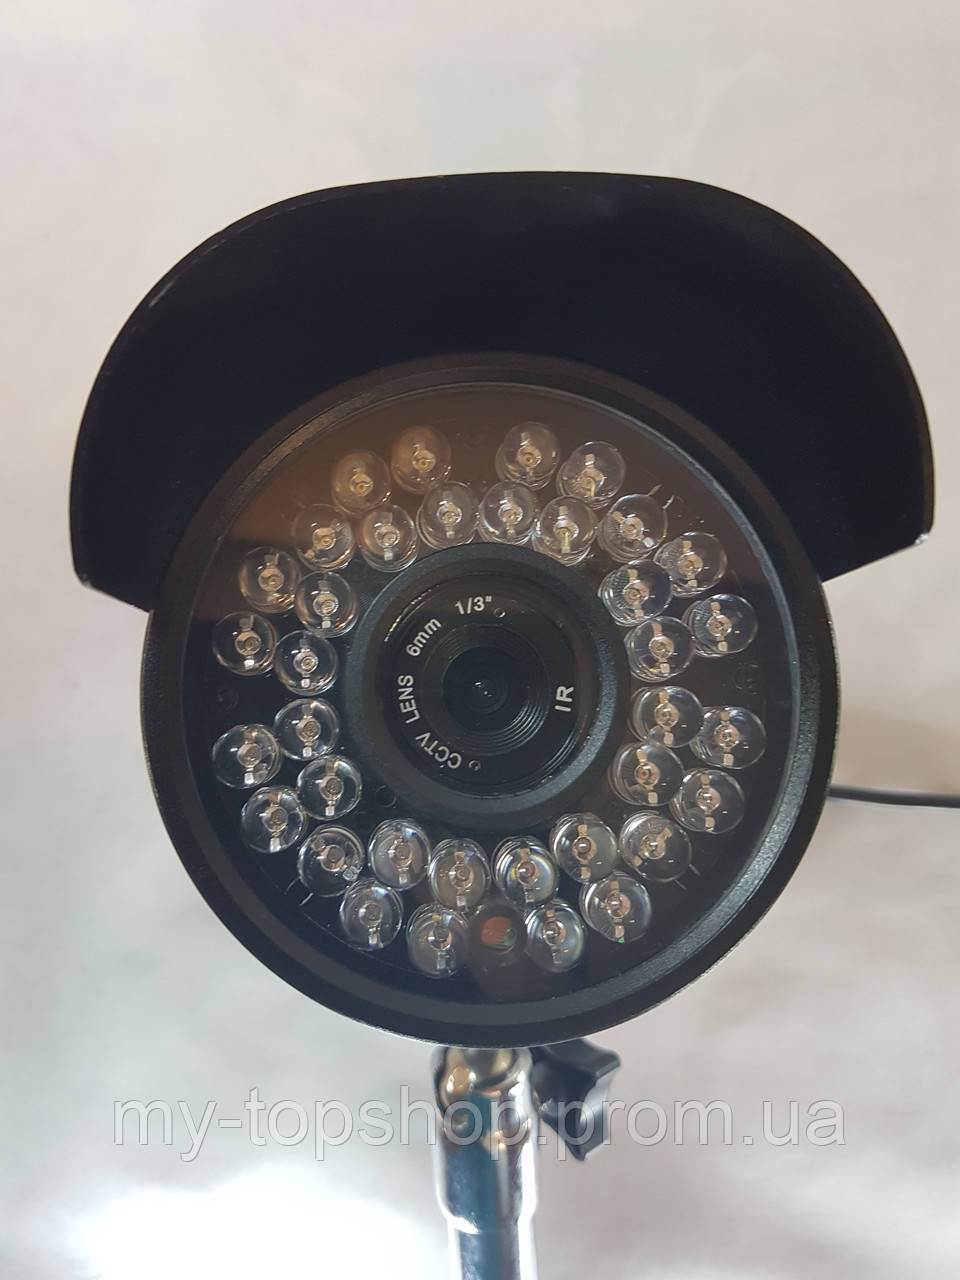 Наружняя камера видеонаблюдения ночная YS-632CCD 8MM